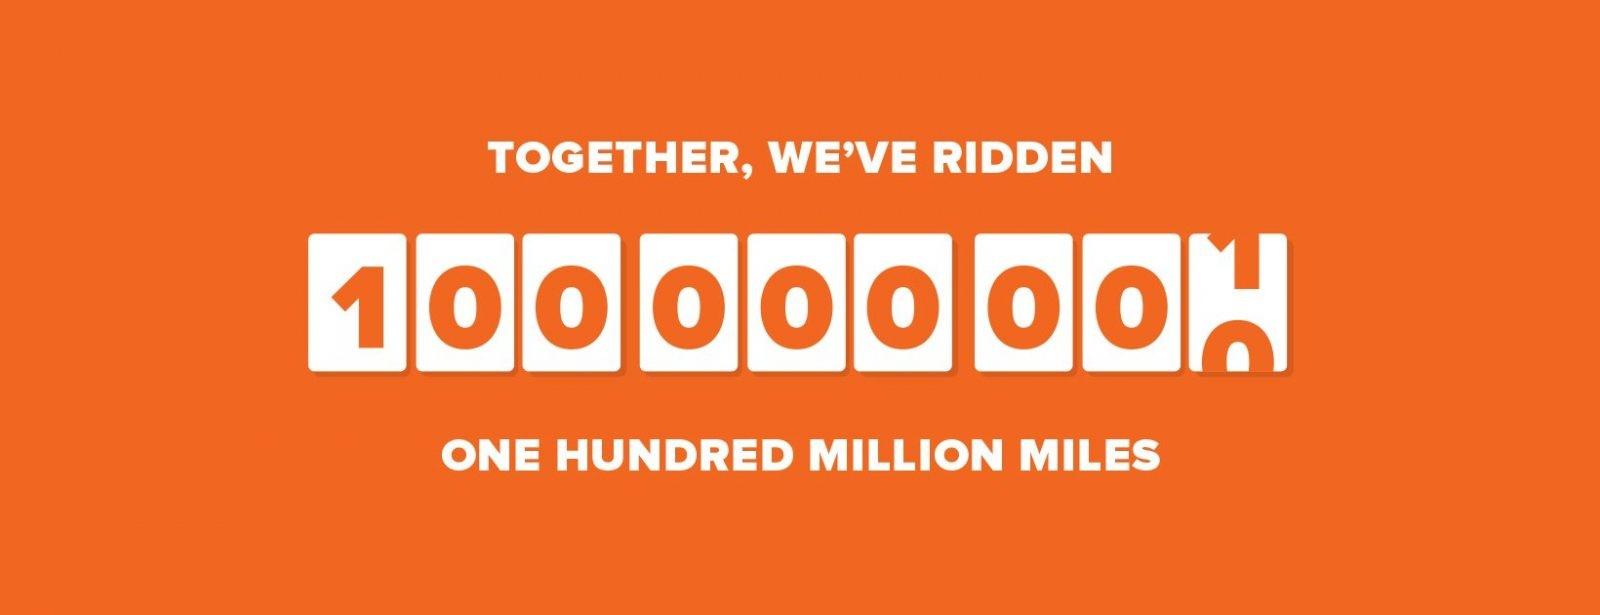 Don t get a big head… but we ve ridden 100 million miles  0e2929e92